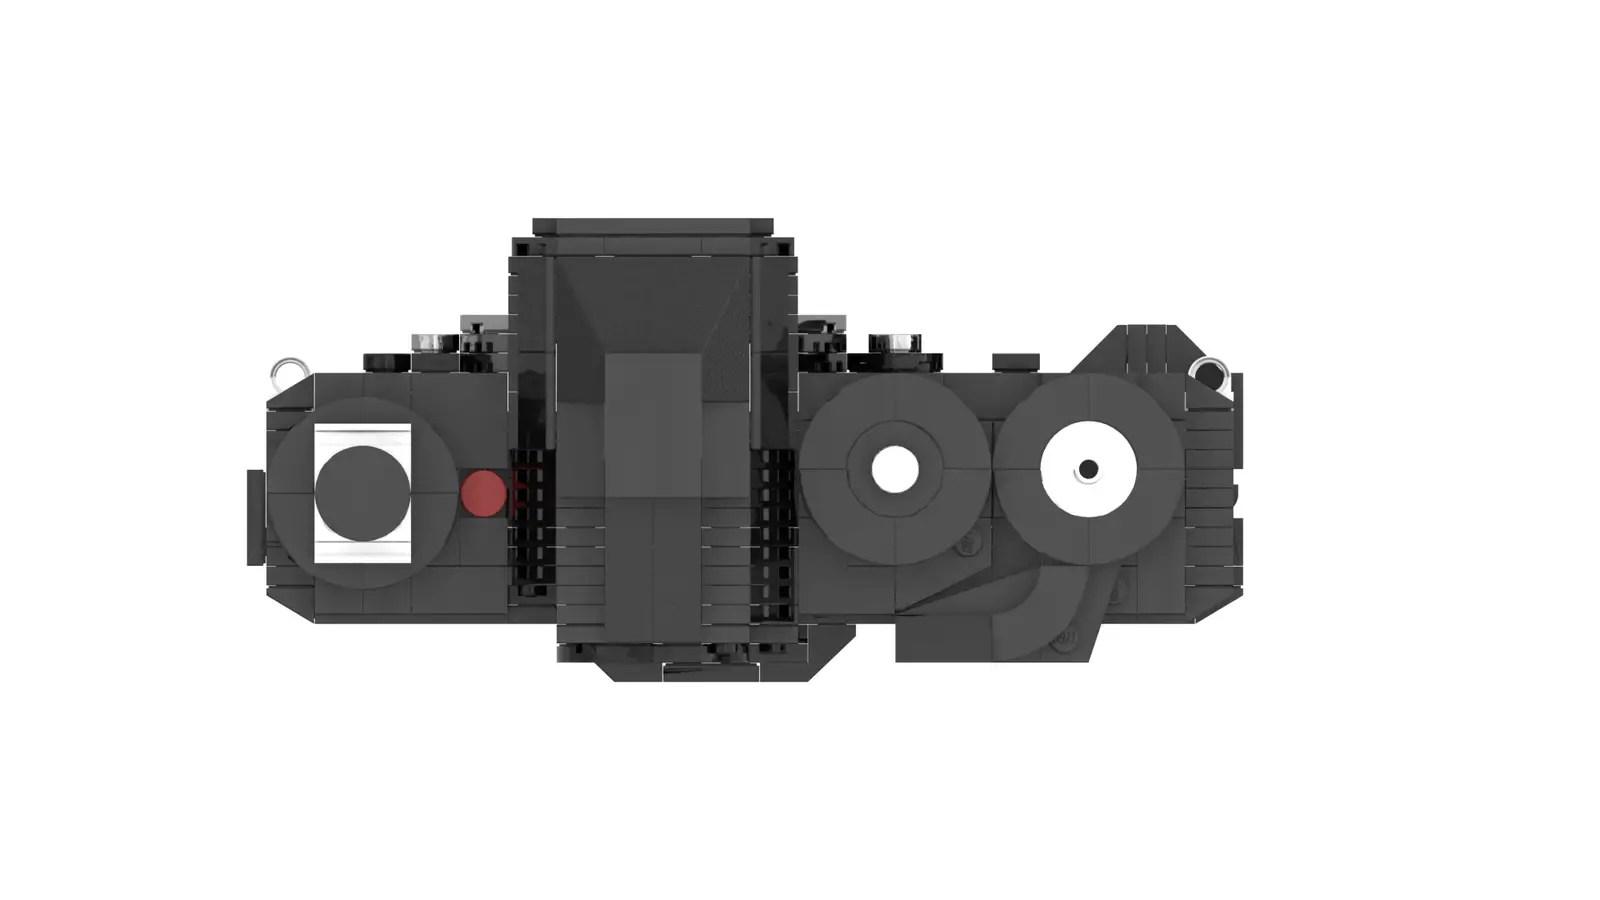 LEGO Nikon F3: Top plate (Credit: Ethan Brossard)